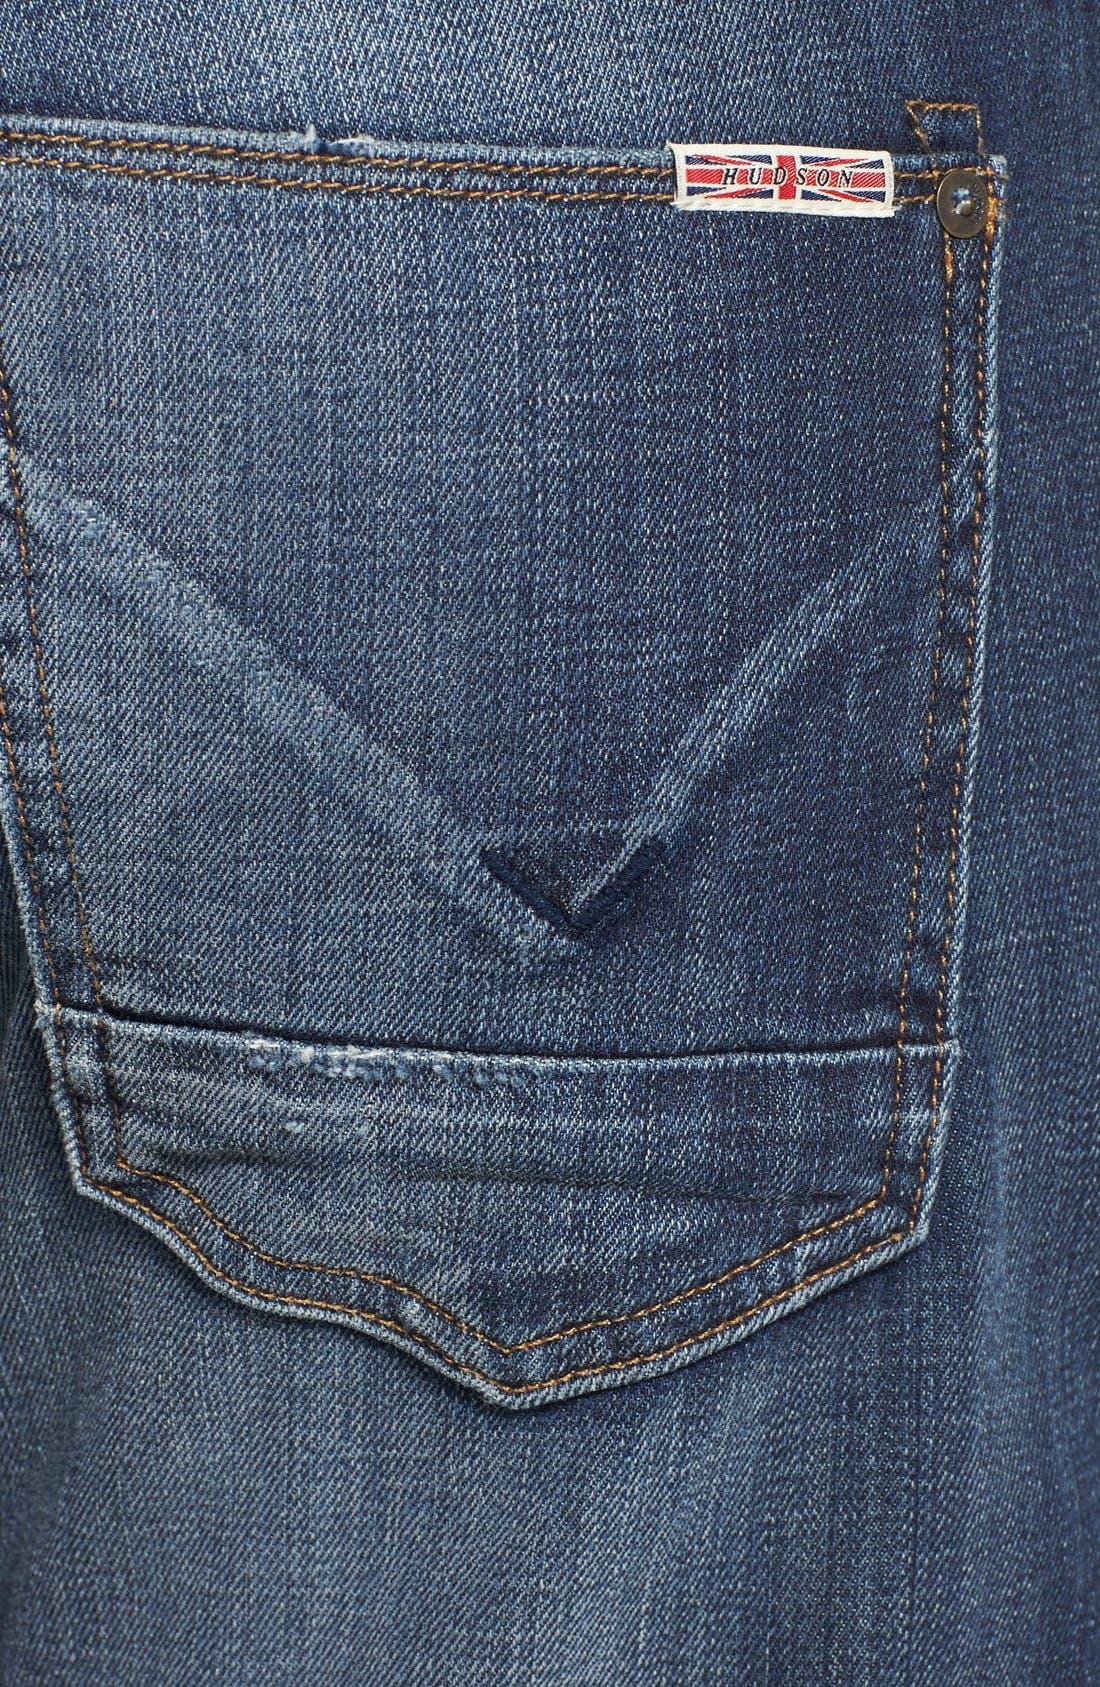 Alternate Image 4  - Hudson Jeans 'Byron' Straight Leg Jeans (Down South)